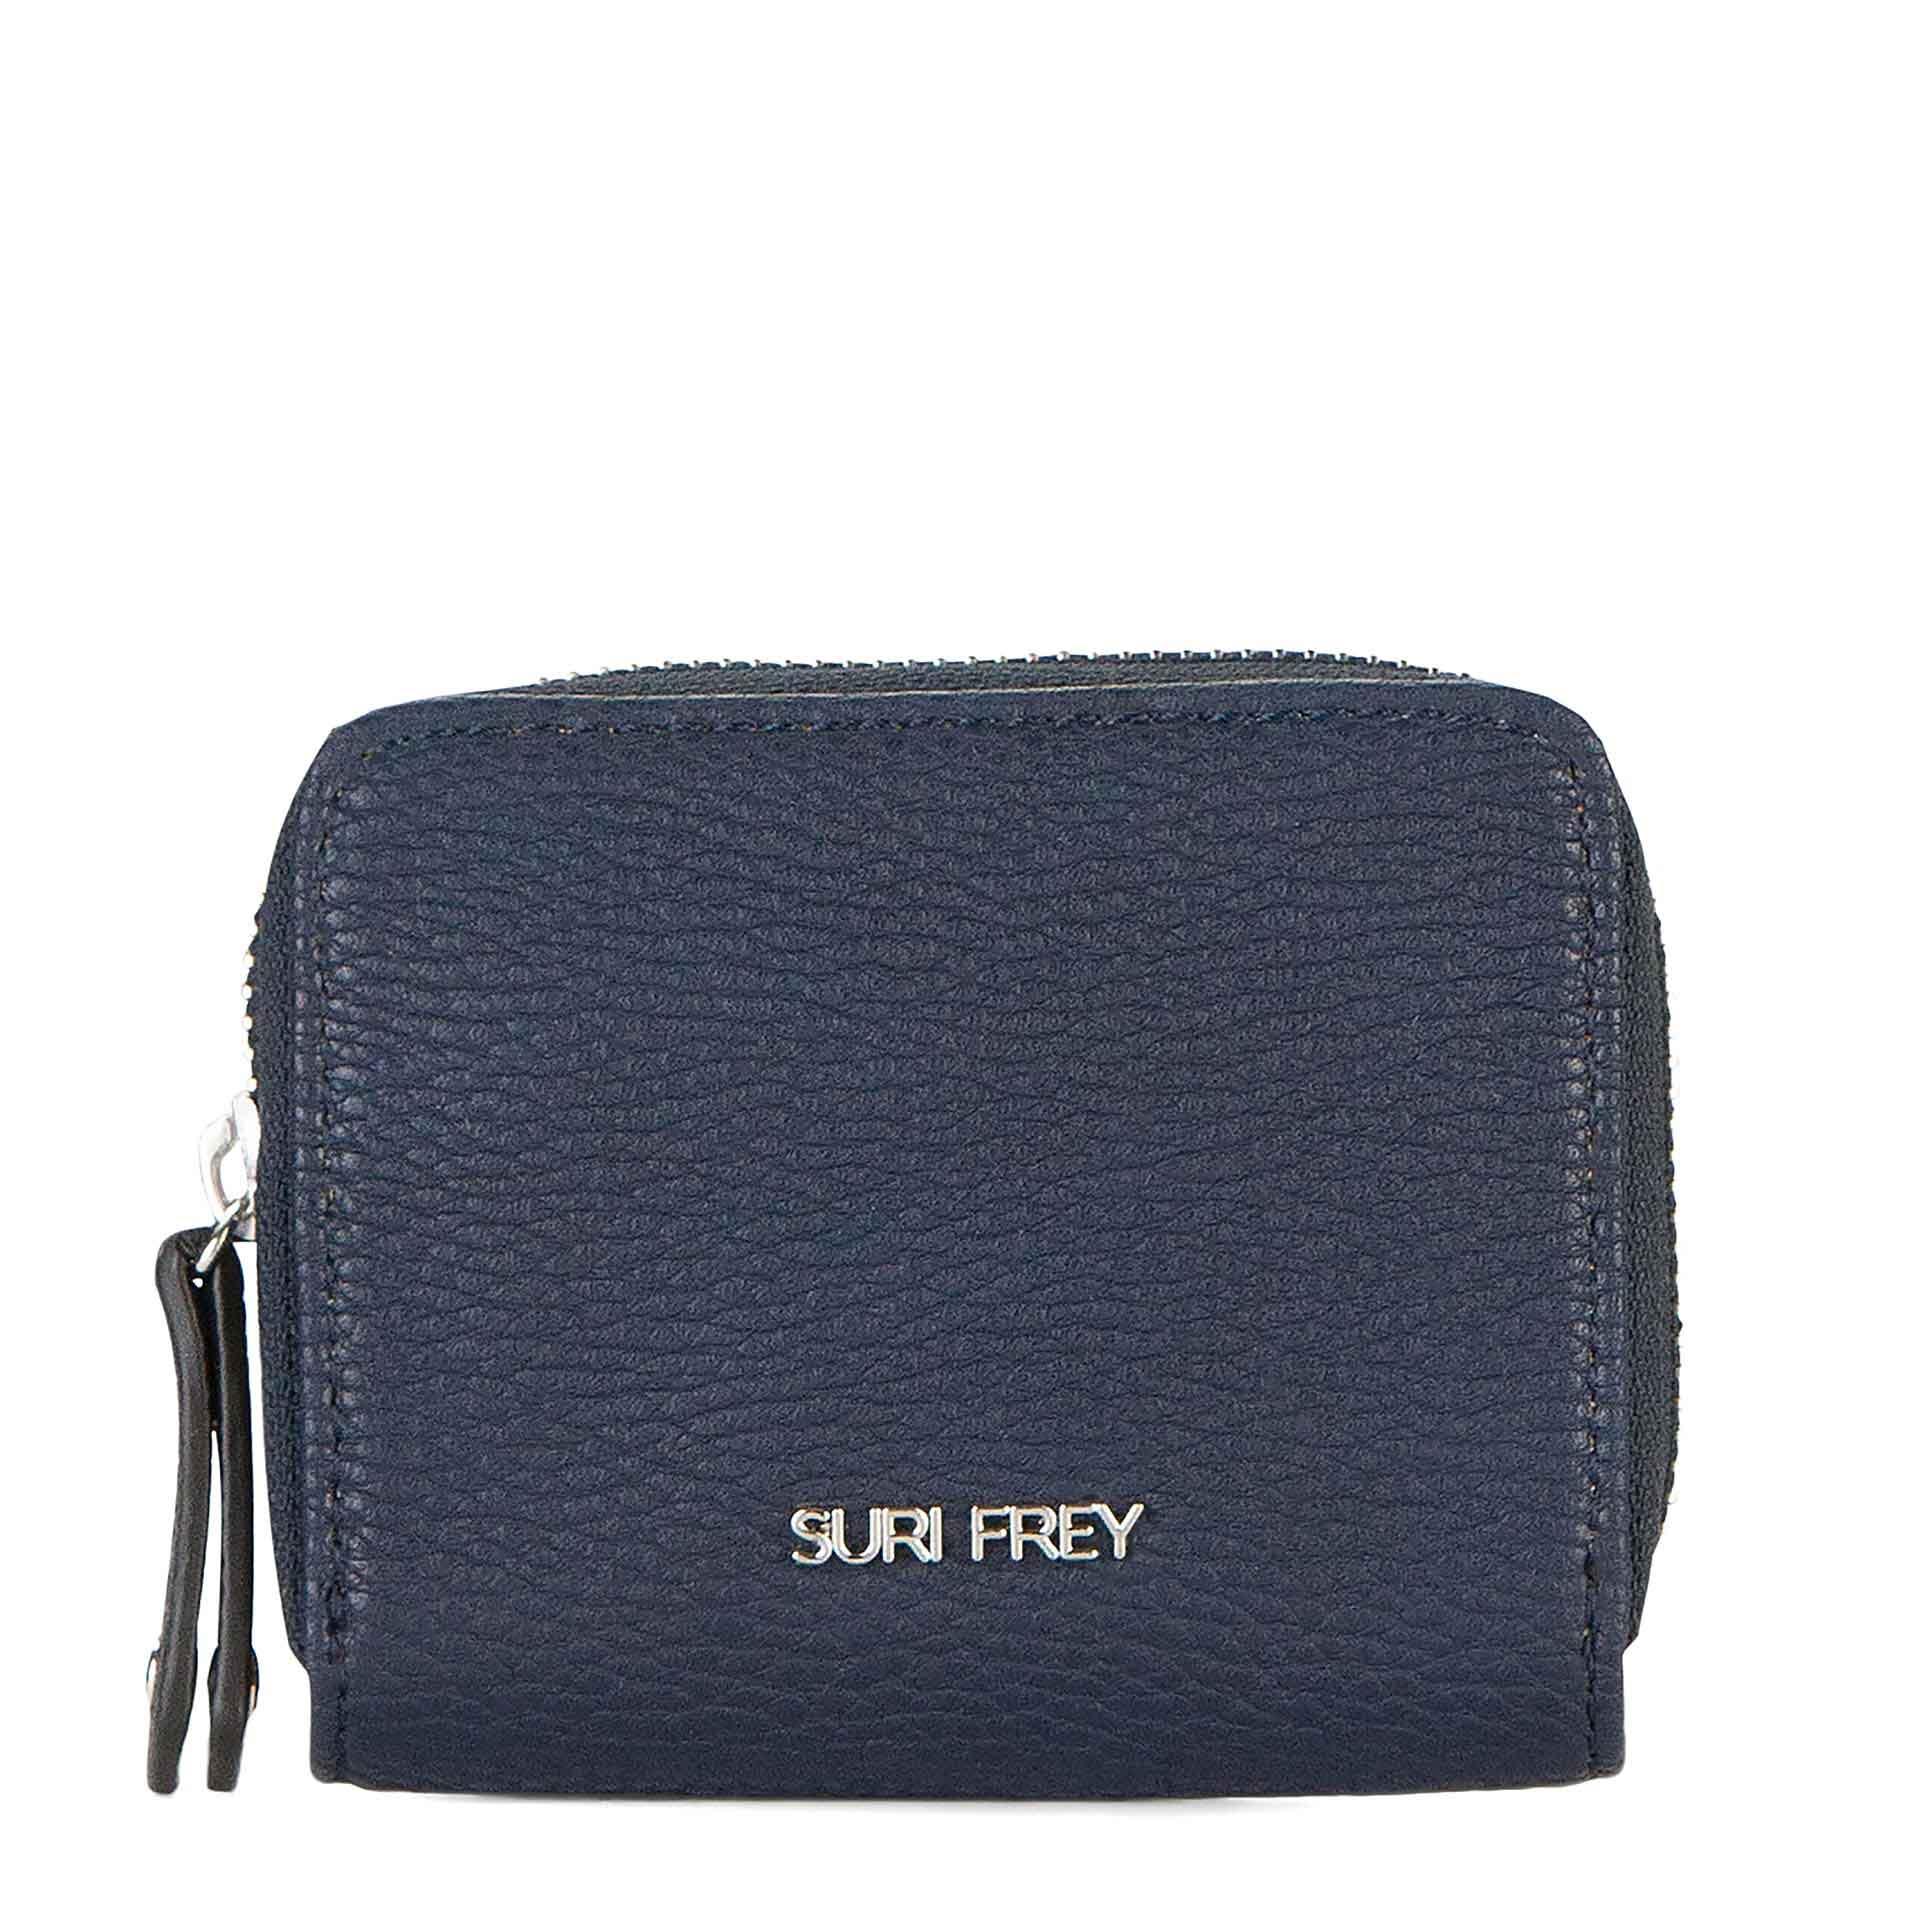 Suri Frey Patsy Damen Geldbörse